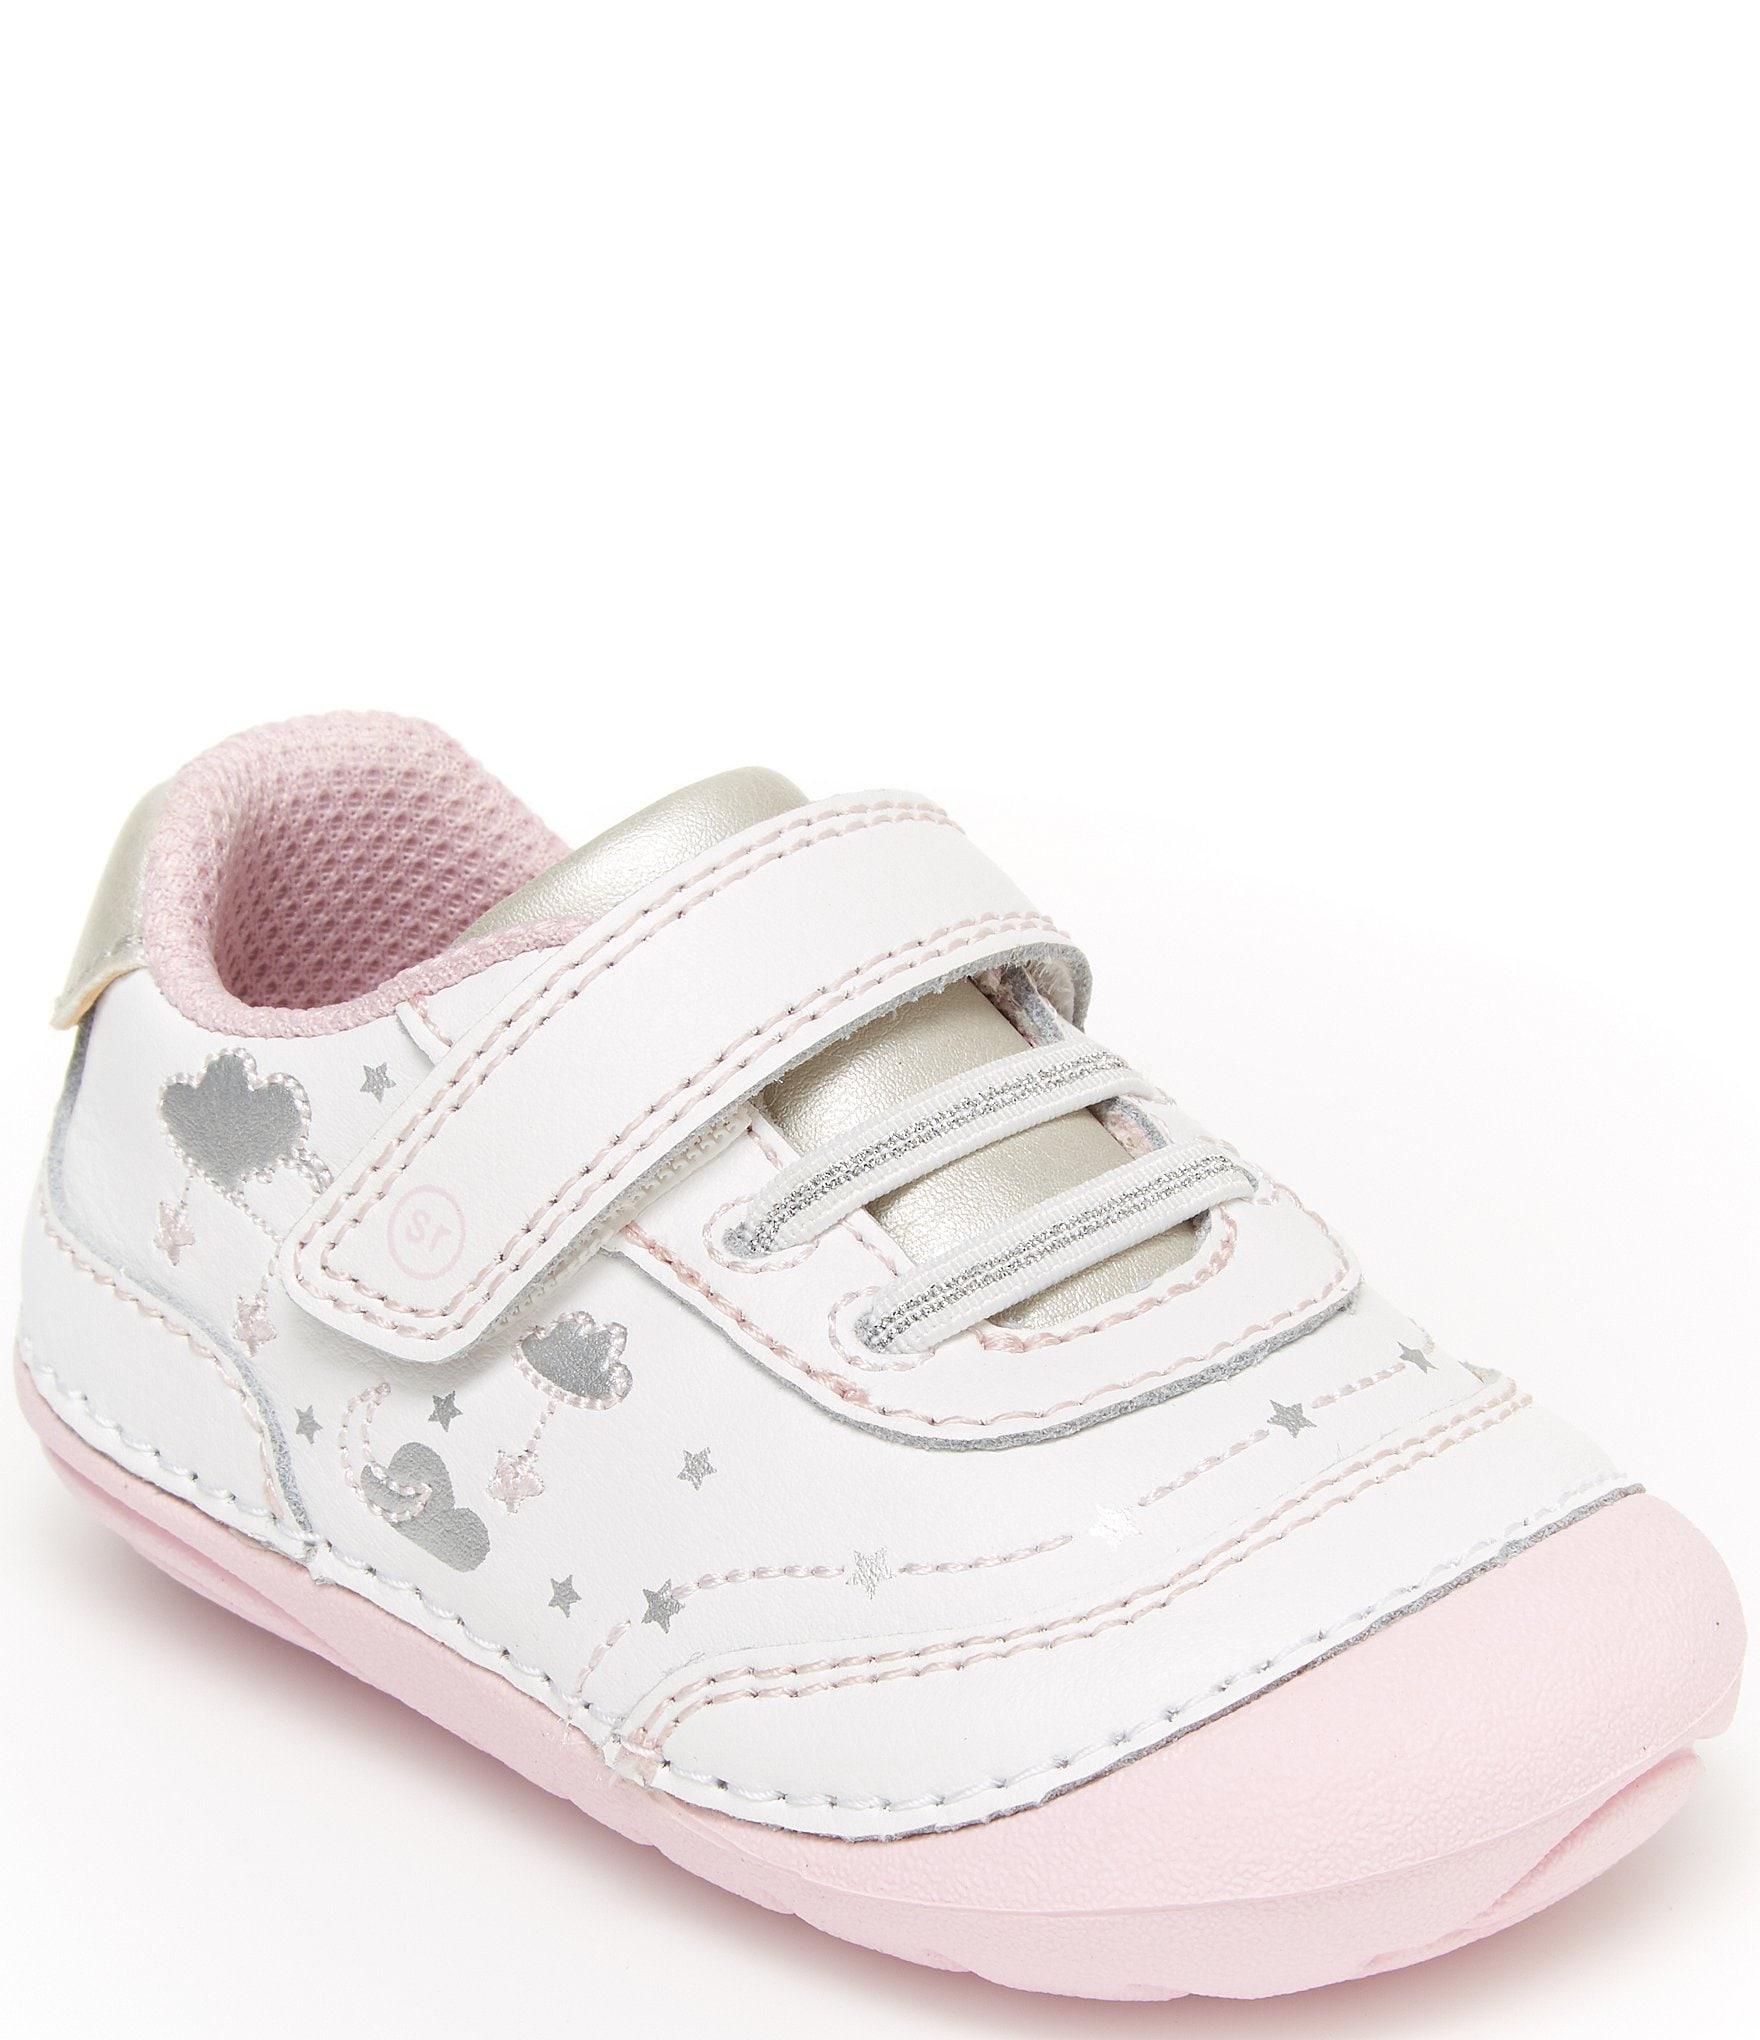 Stride Rite Baby Girls Dash Infant//Toddler